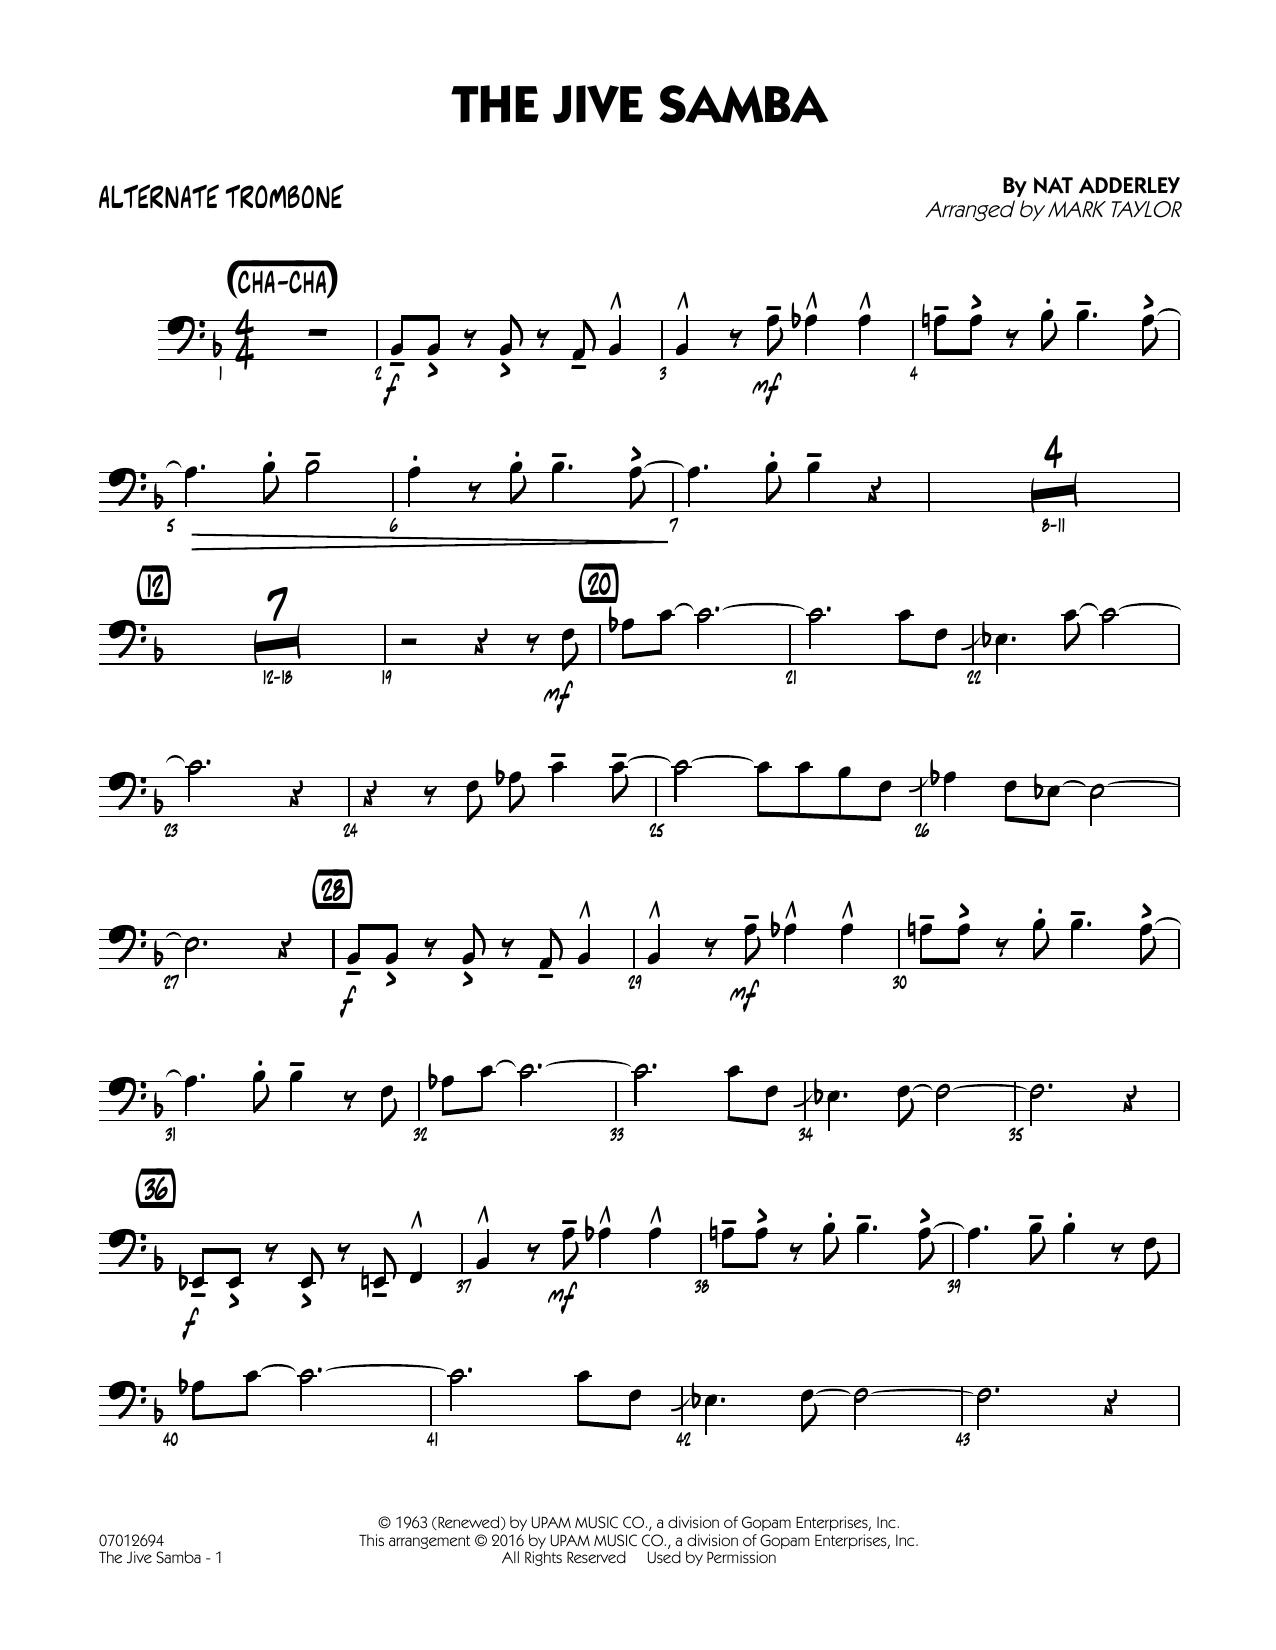 The Jive Samba - Alternate Trombone (Jazz Ensemble)